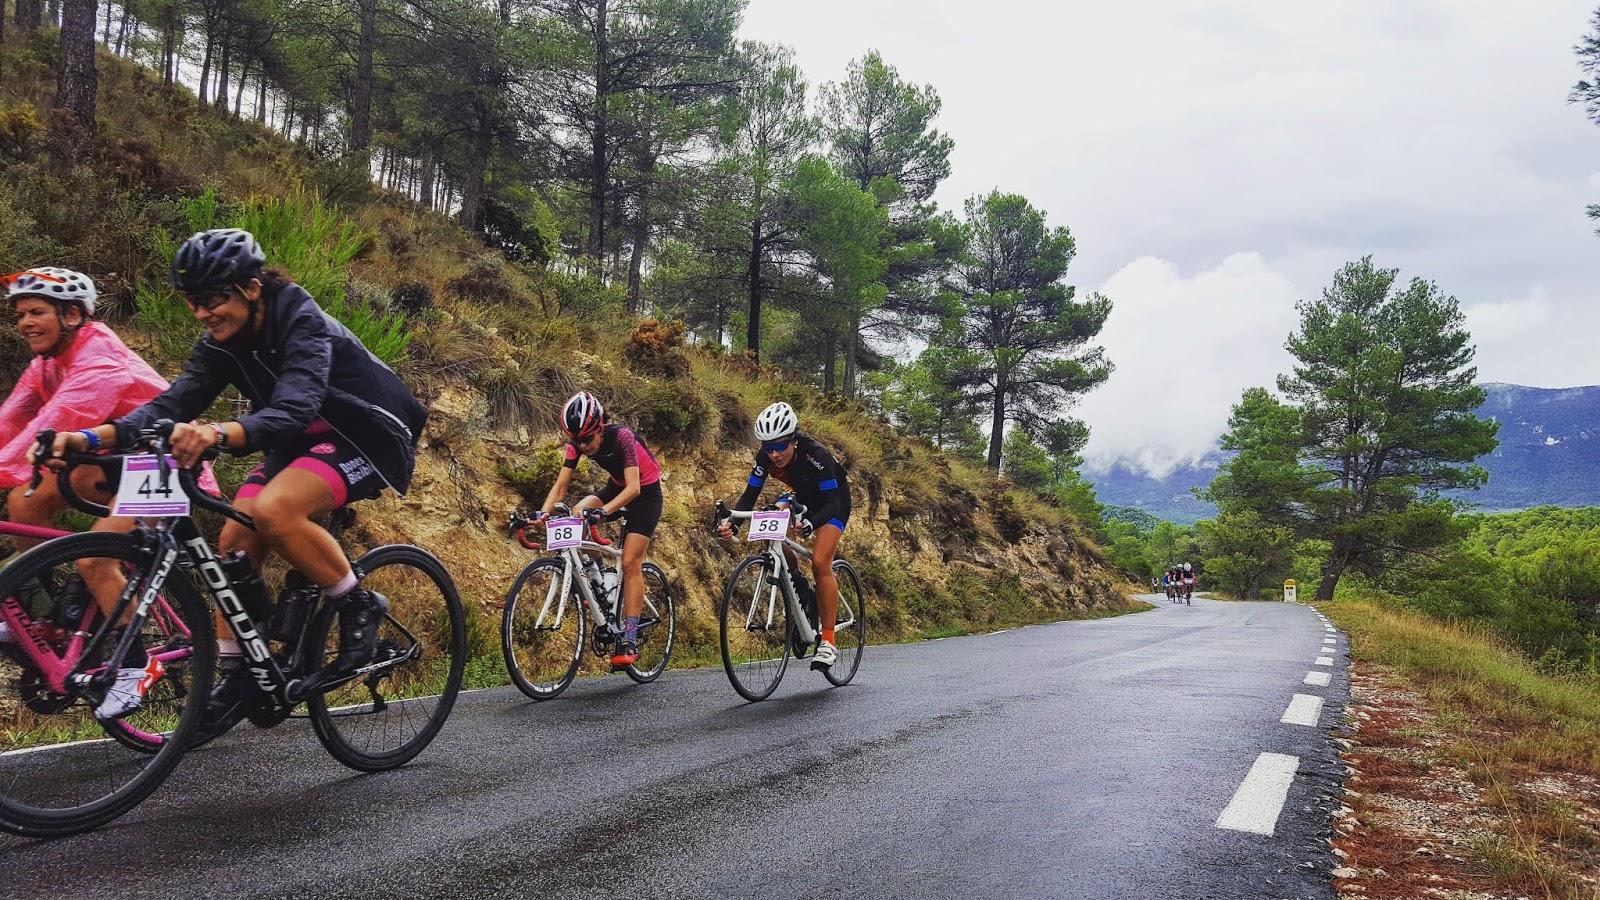 Cyclists riding in Sierra Mariola, Alicante, Spain